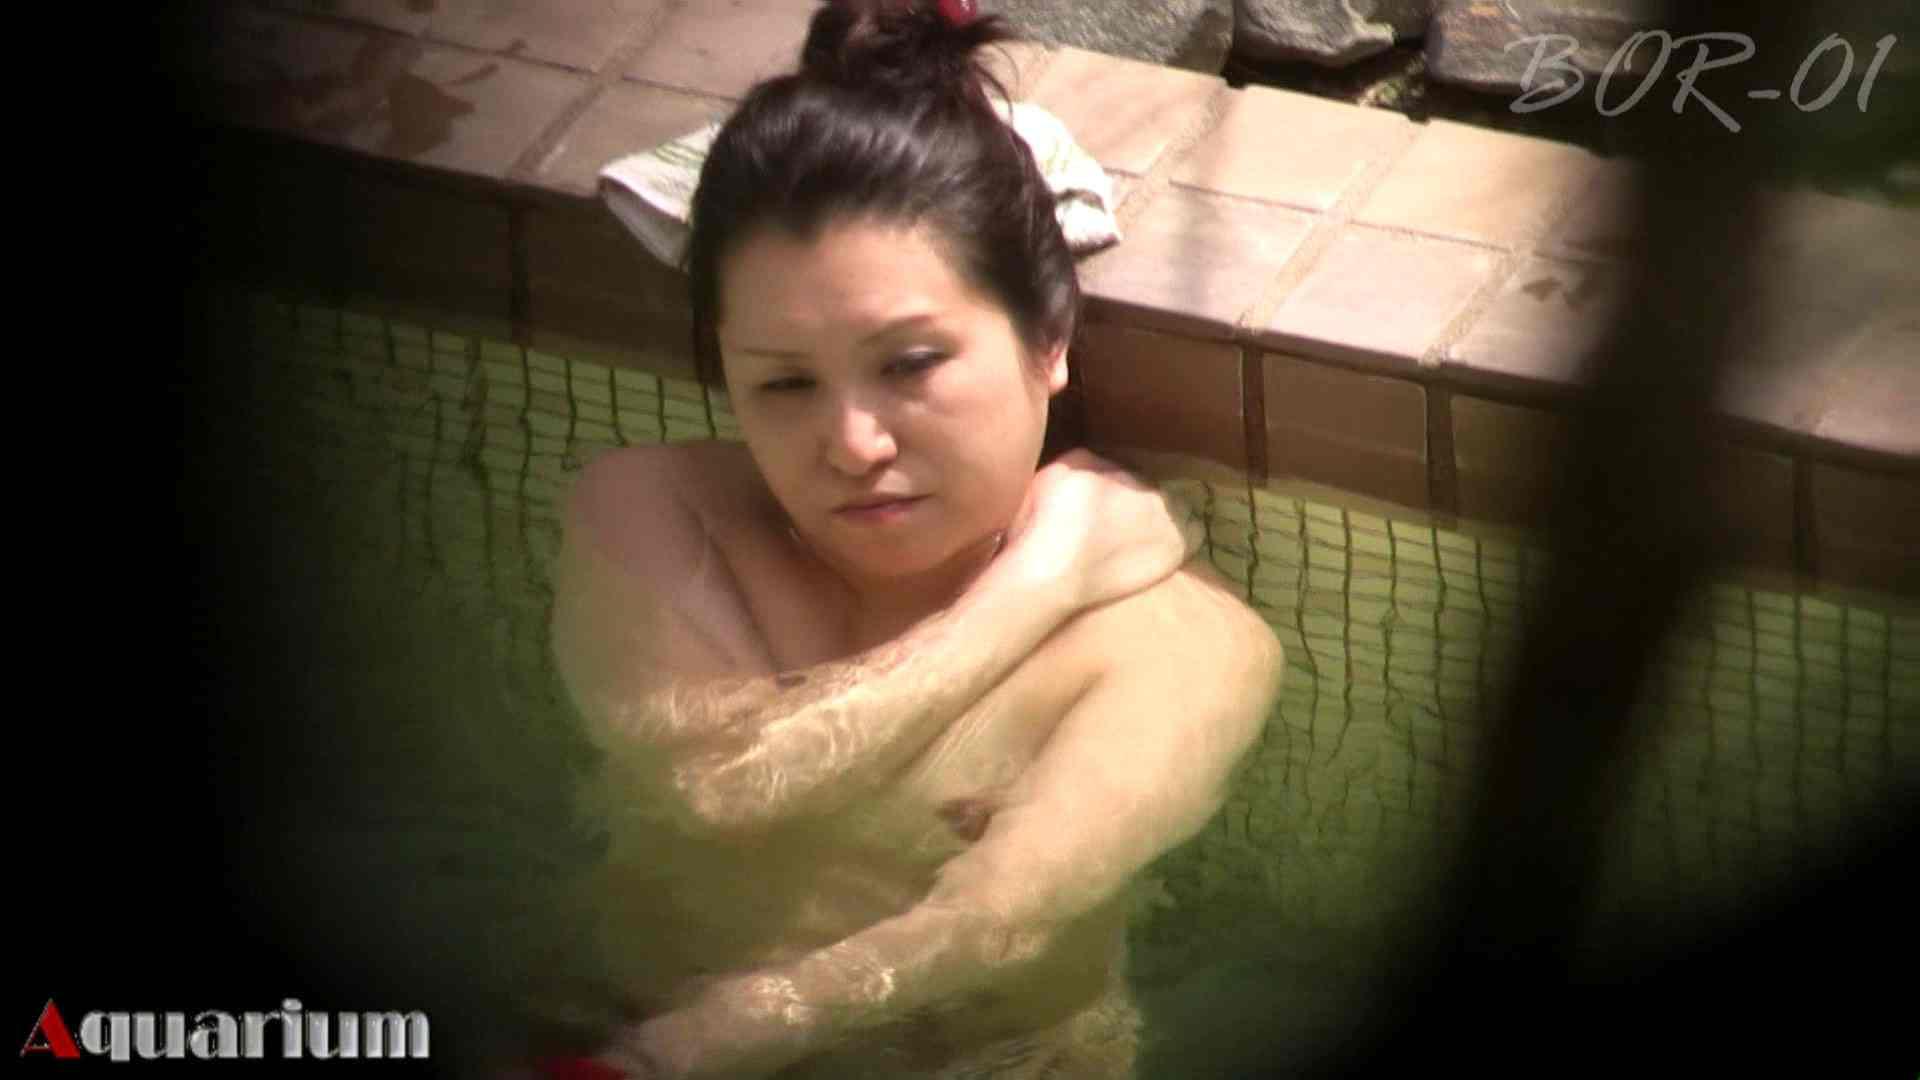 Aquaな露天風呂Vol.458 露天風呂 | OLのエロ生活  29連発 19